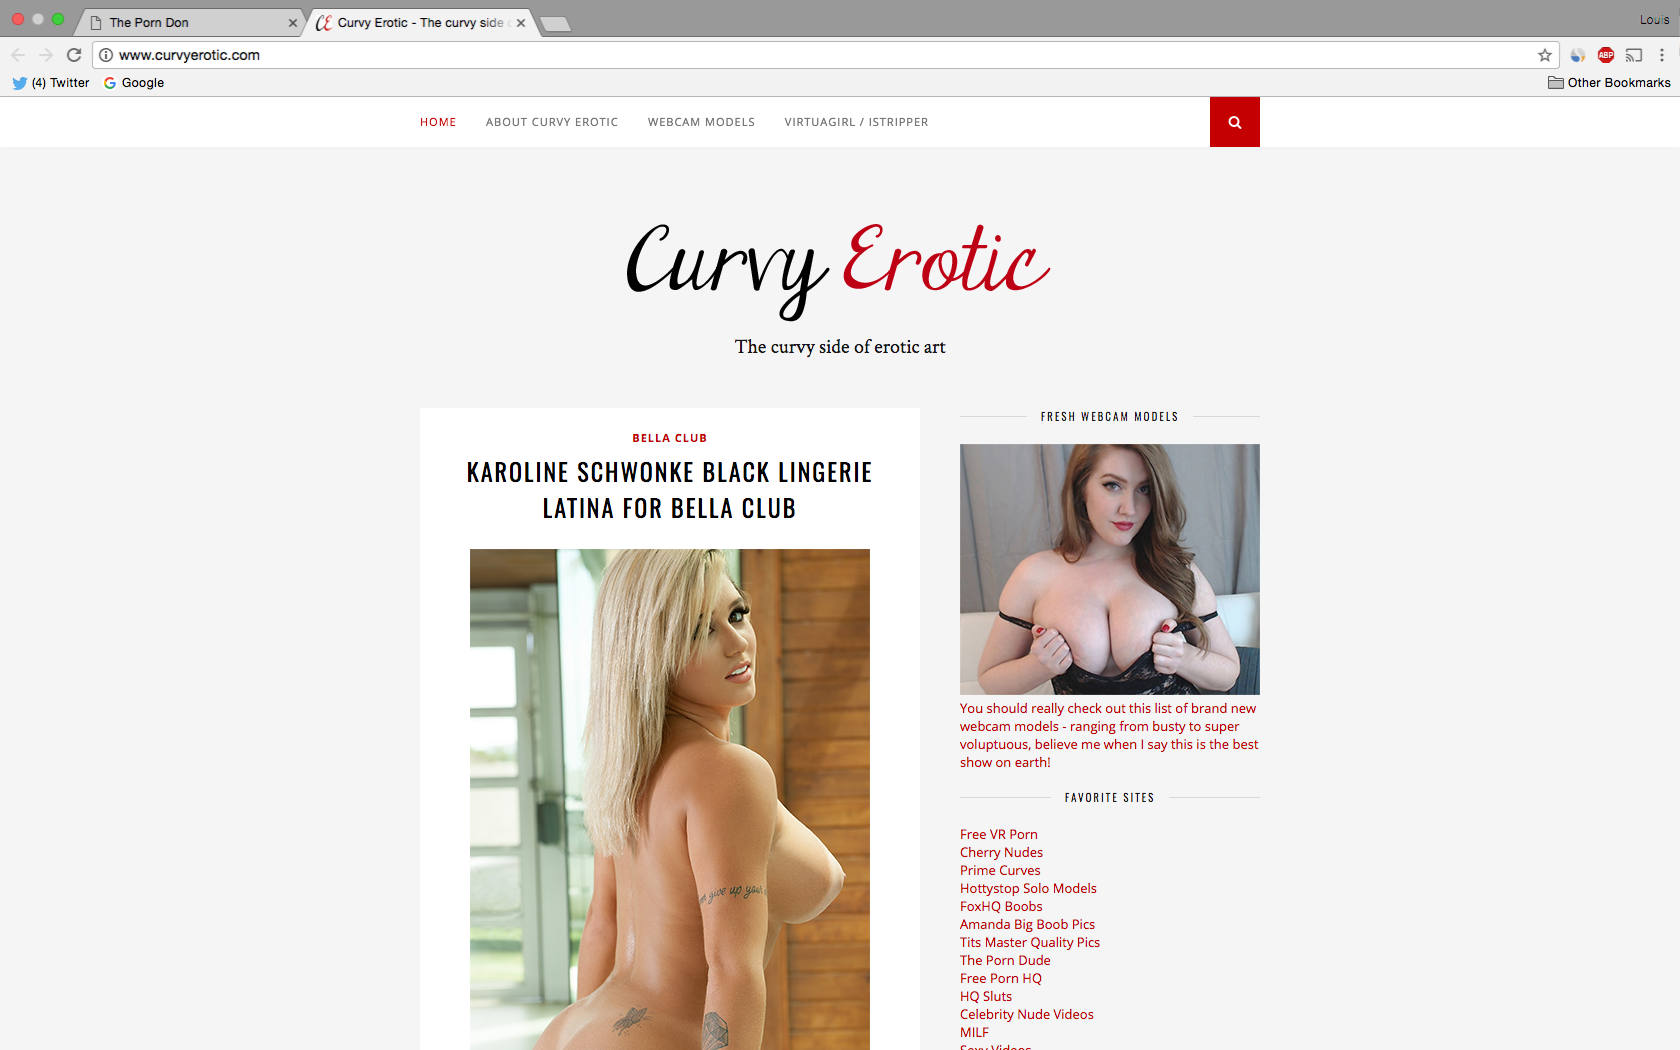 CurvyErotic